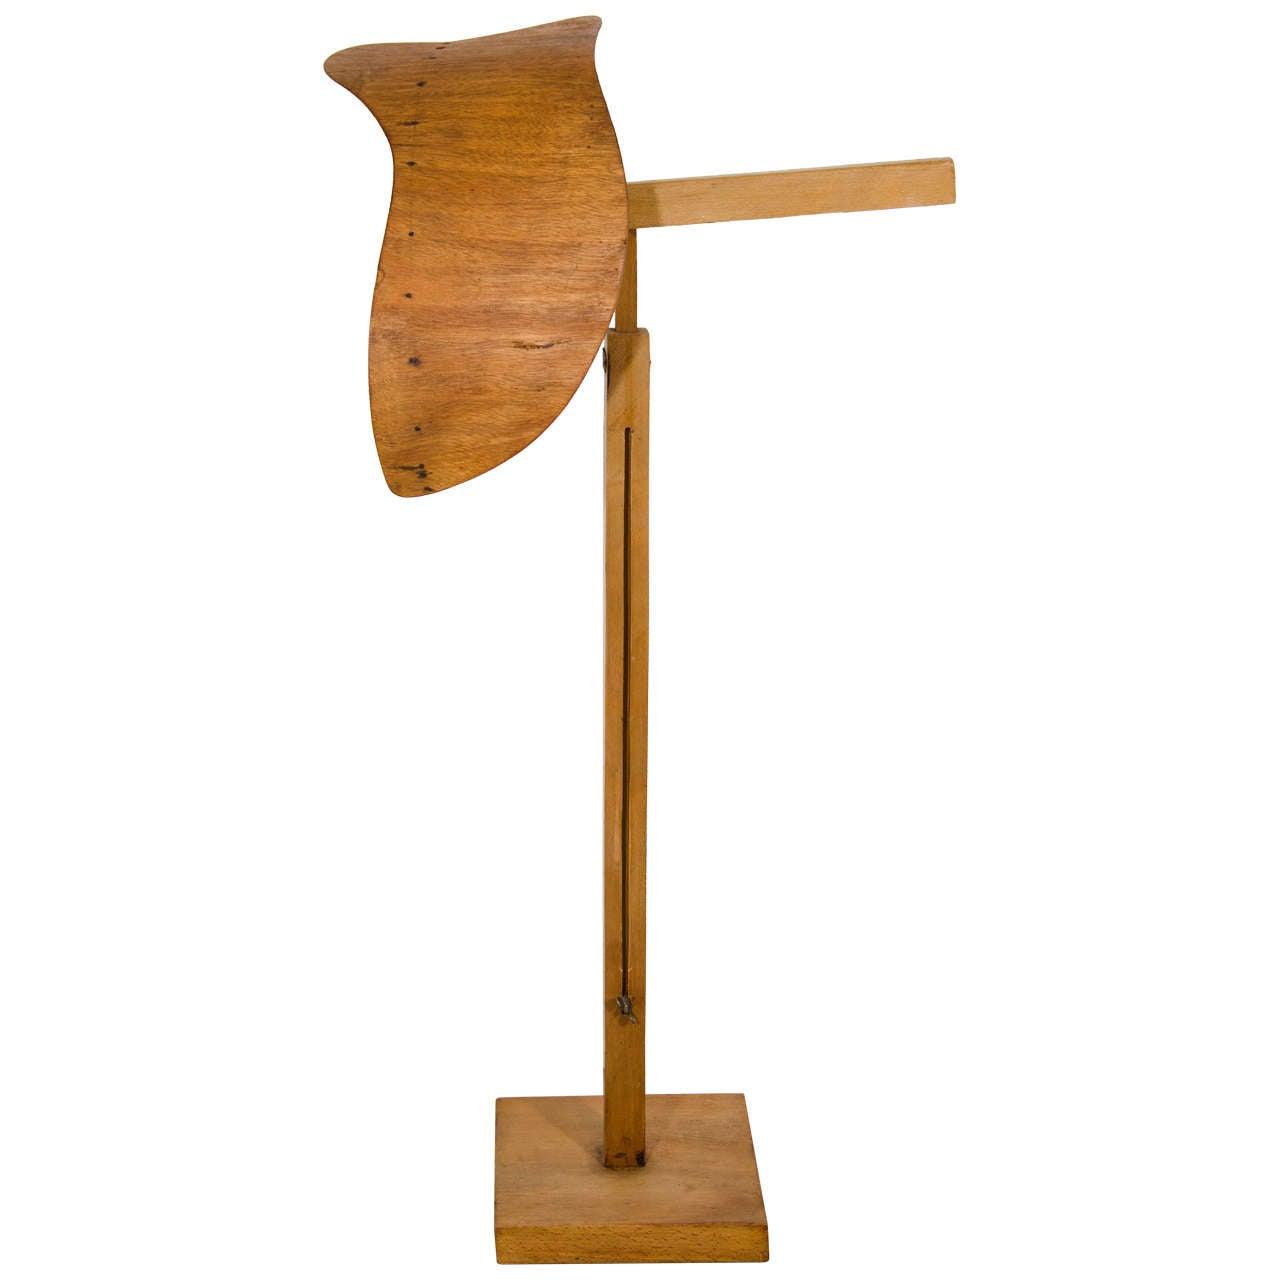 Siegel Wooden Display Form 1